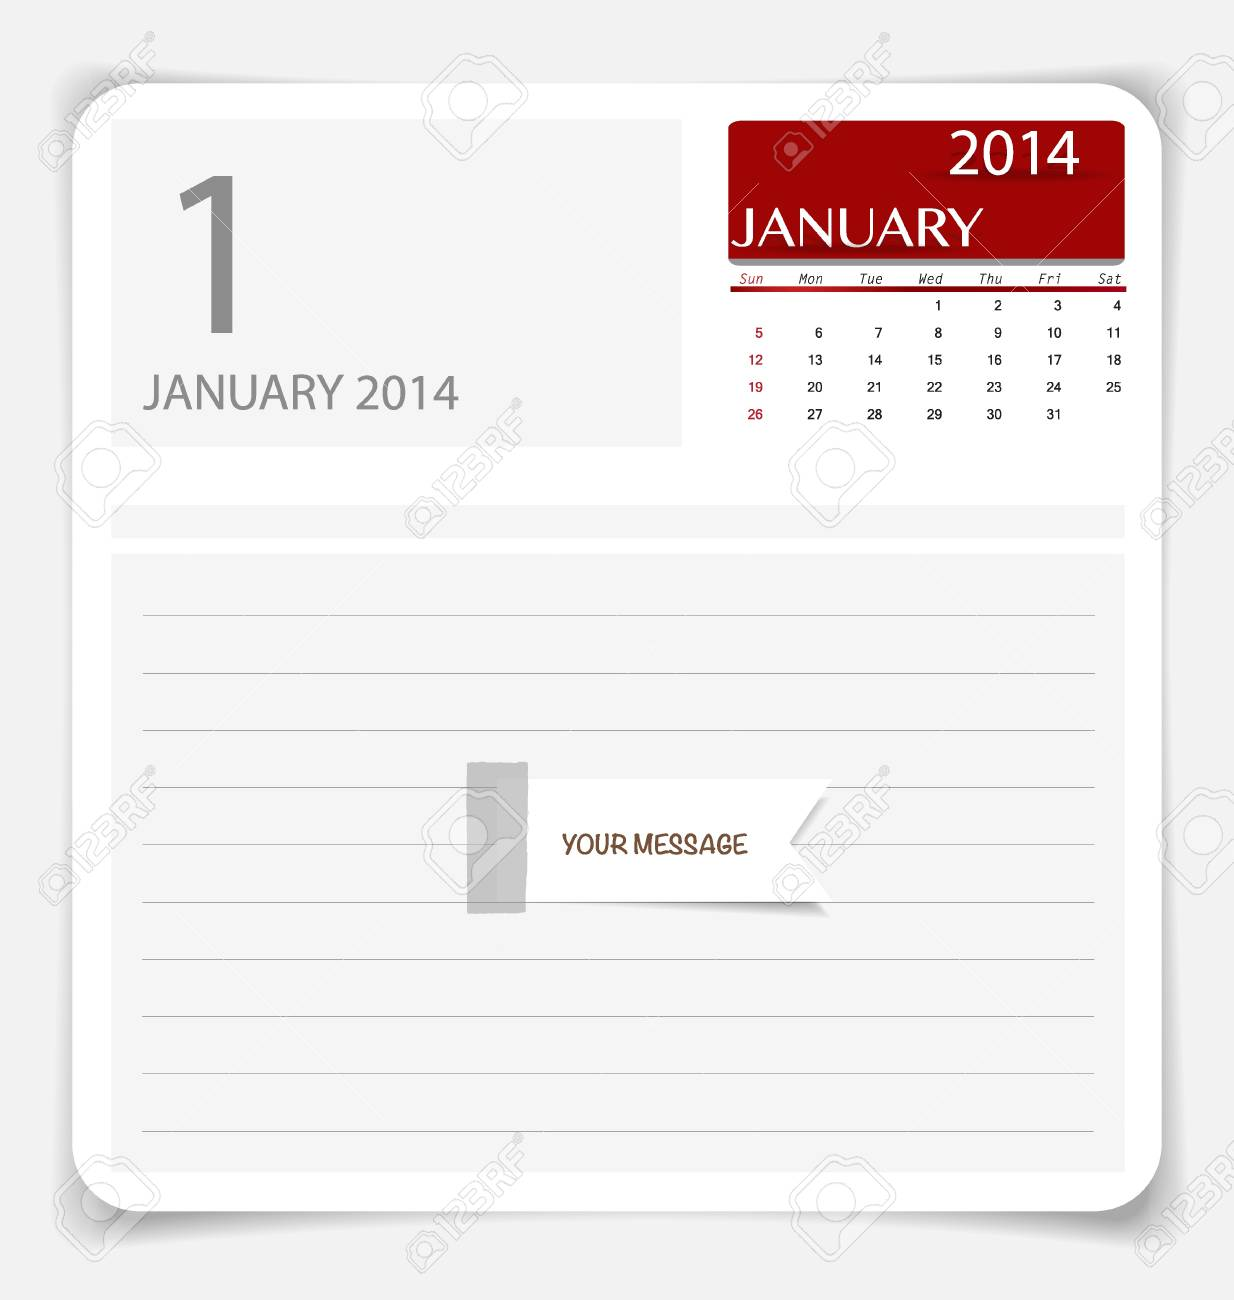 Simple 2014 calendar, January. illustration. Stock Vector - 21693624